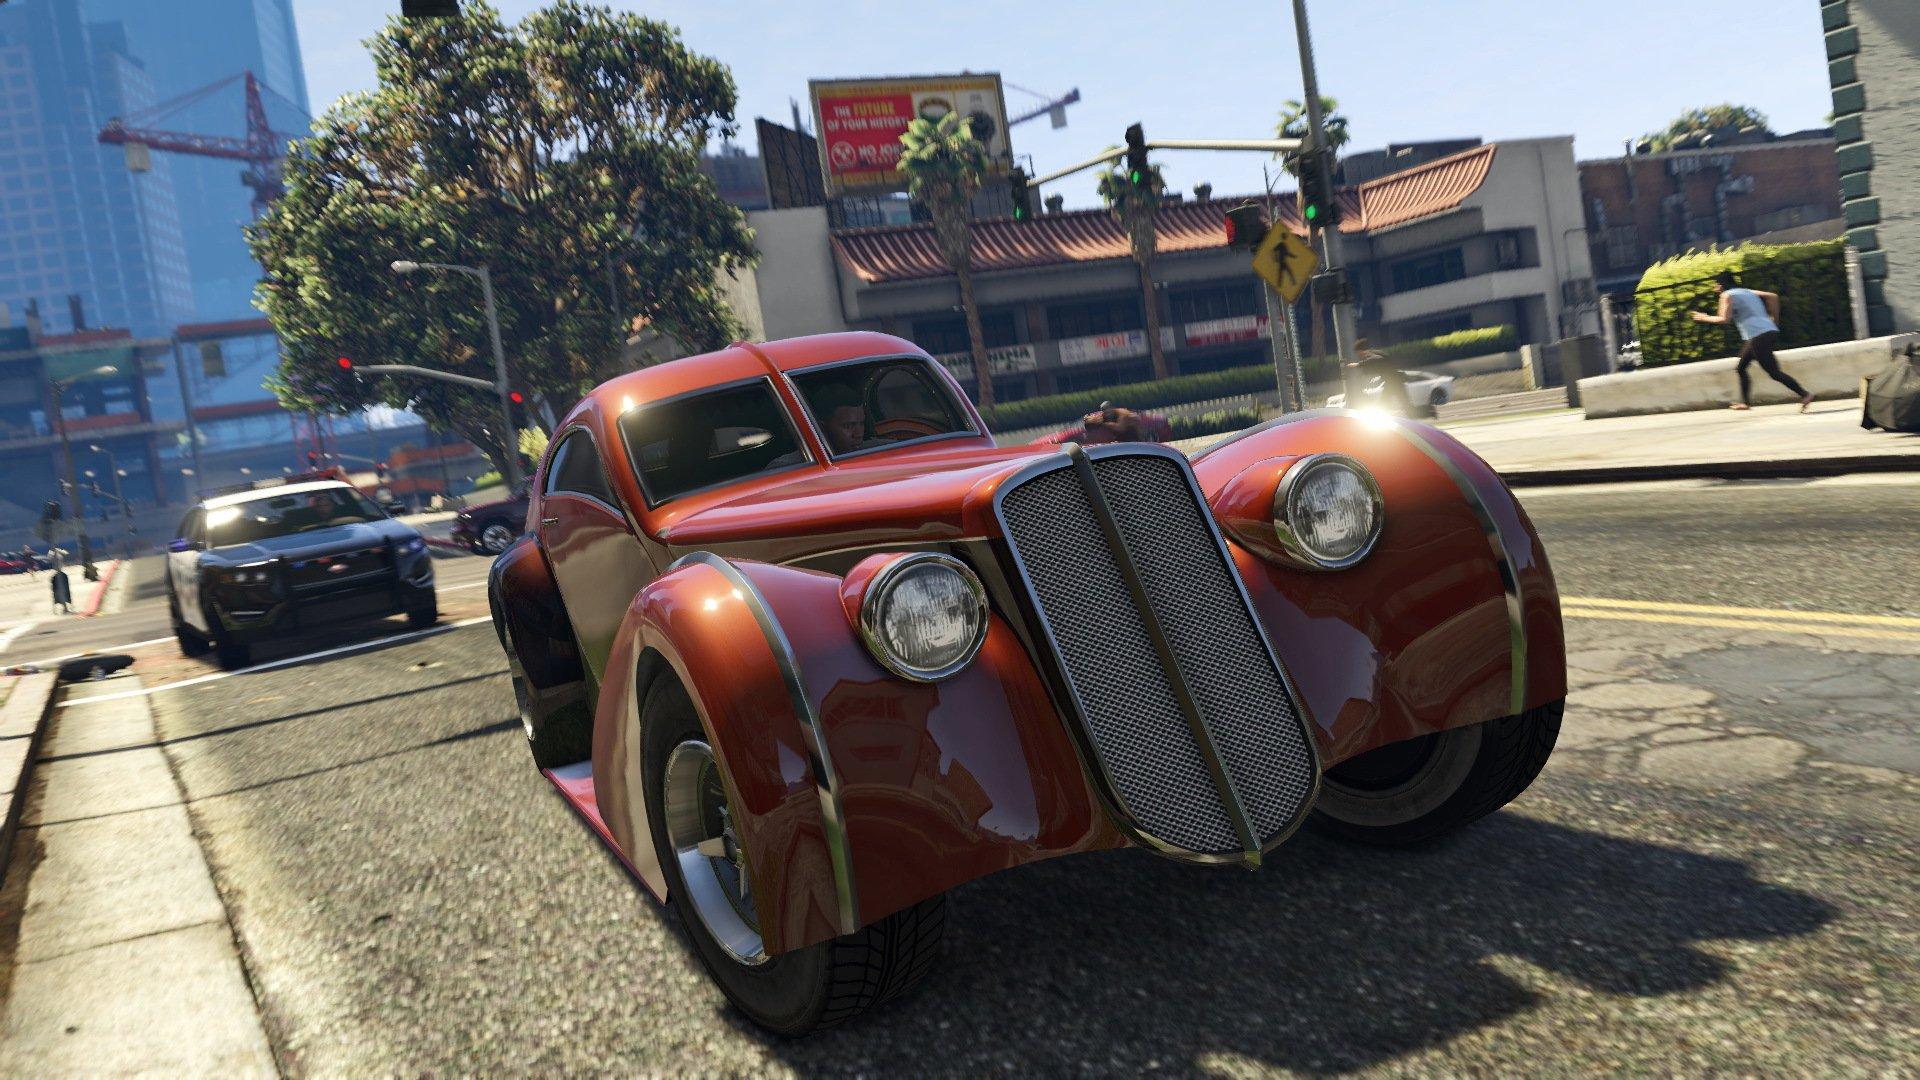 gta v Free shipping buy grand theft auto v, rockstar games, playstation 4, 710425475252 at walmartcom.